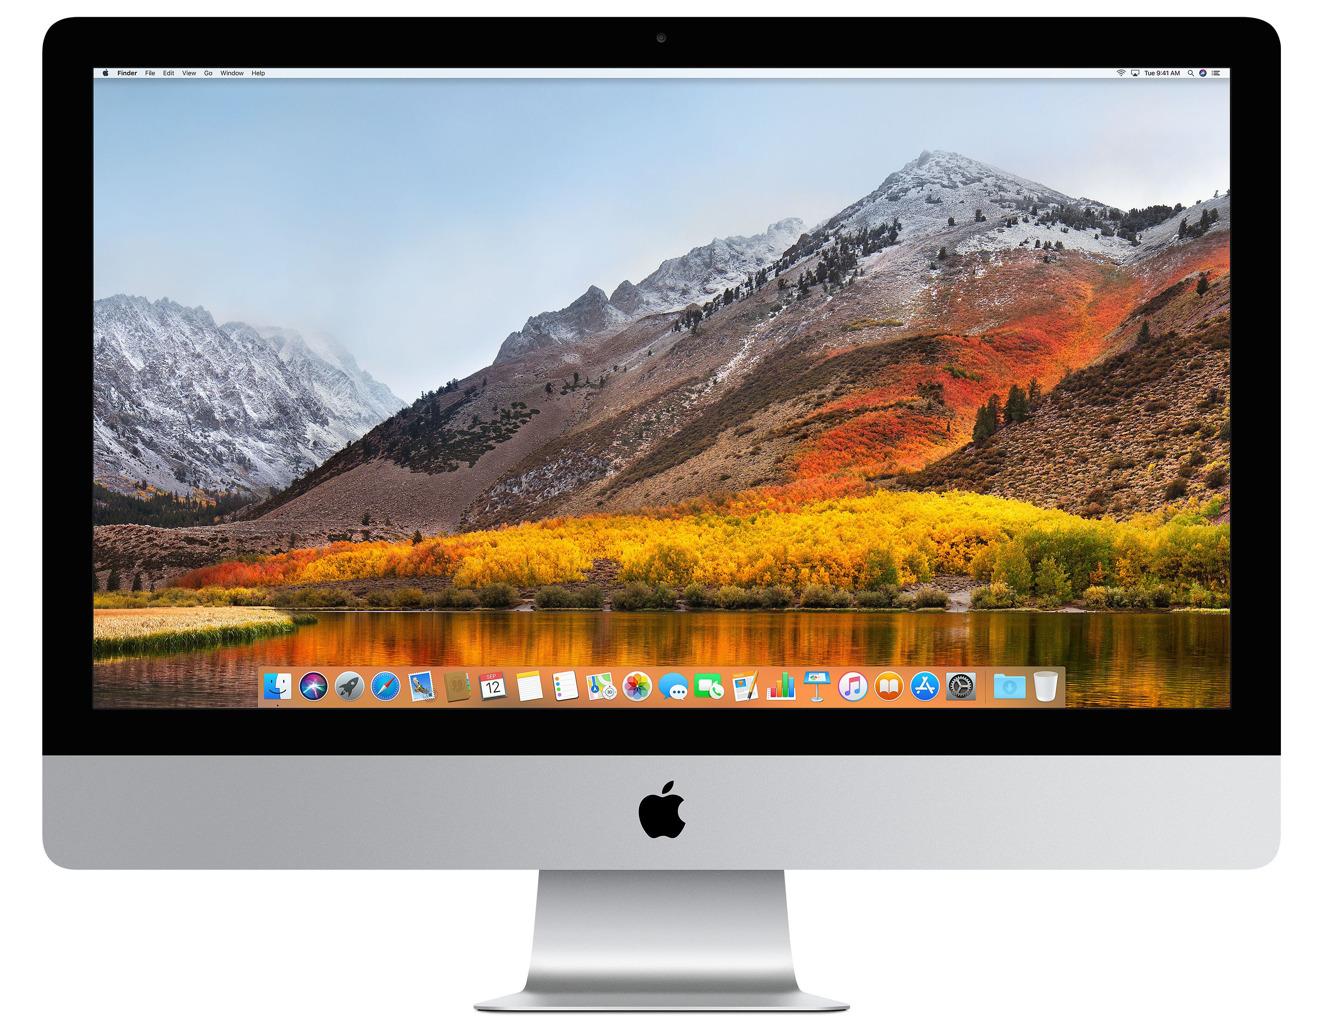 Apple Mid 2017 27 inch iMac Retina 5K desktop computer